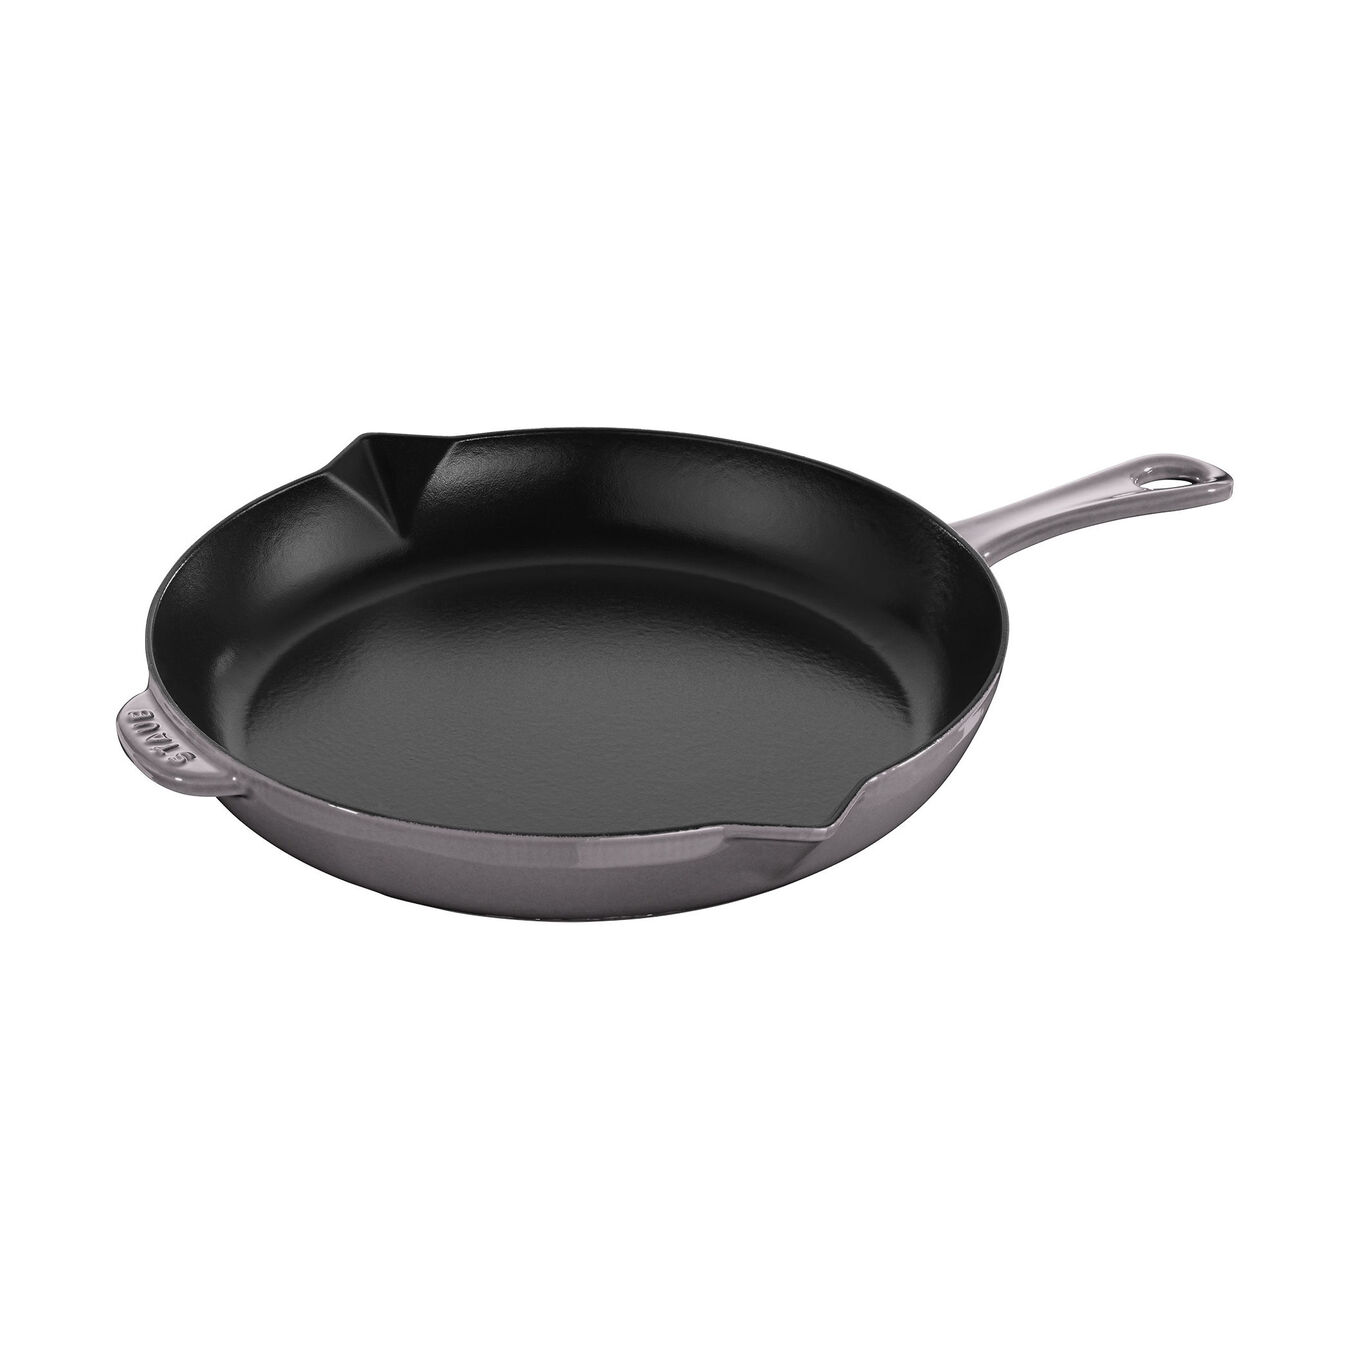 12-inch Fry Pan - Graphite Grey,,large 1